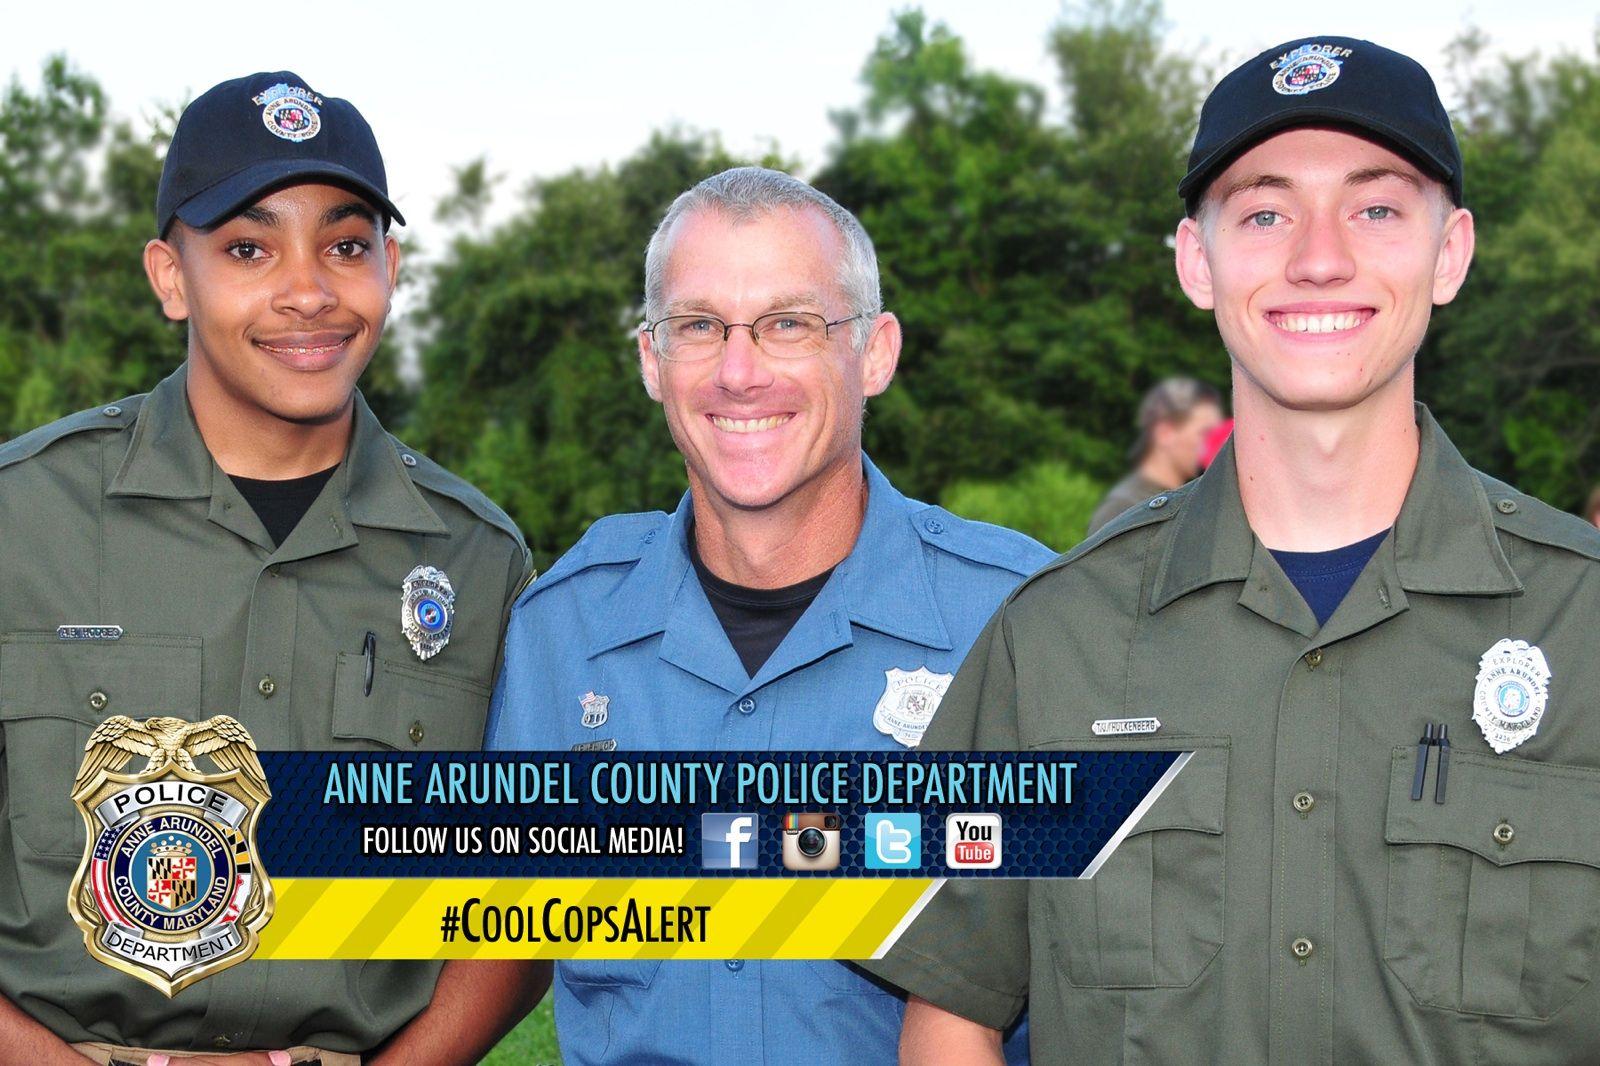 The Police Explorer Program C Ops Social Media Police Department